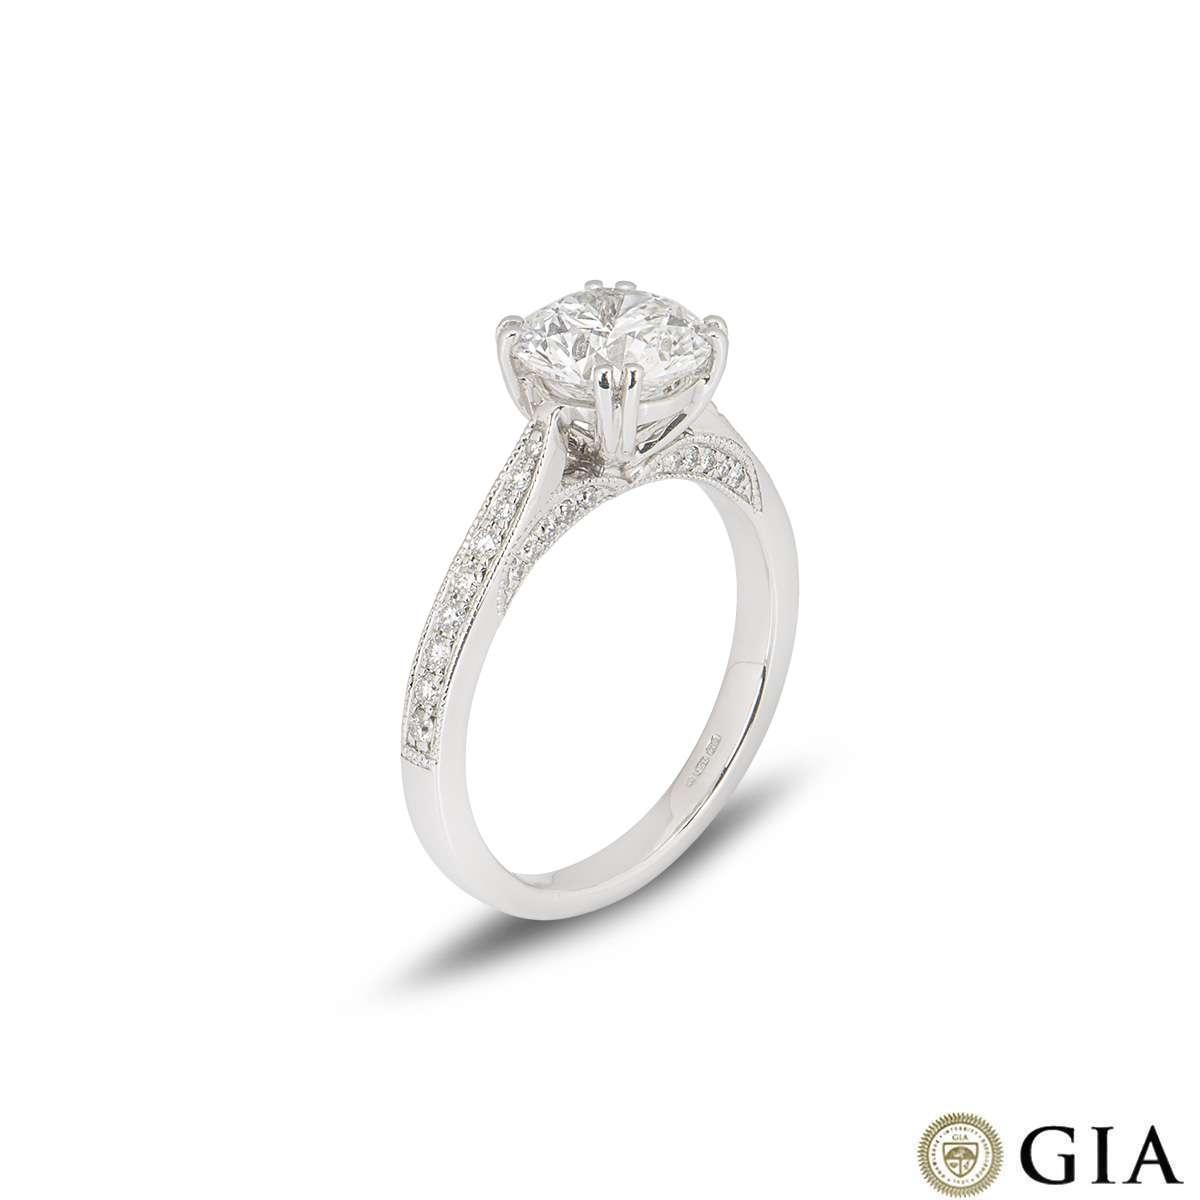 18k White Gold Round Brilliant Cut Diamond Ring 1.70ct F/VS1